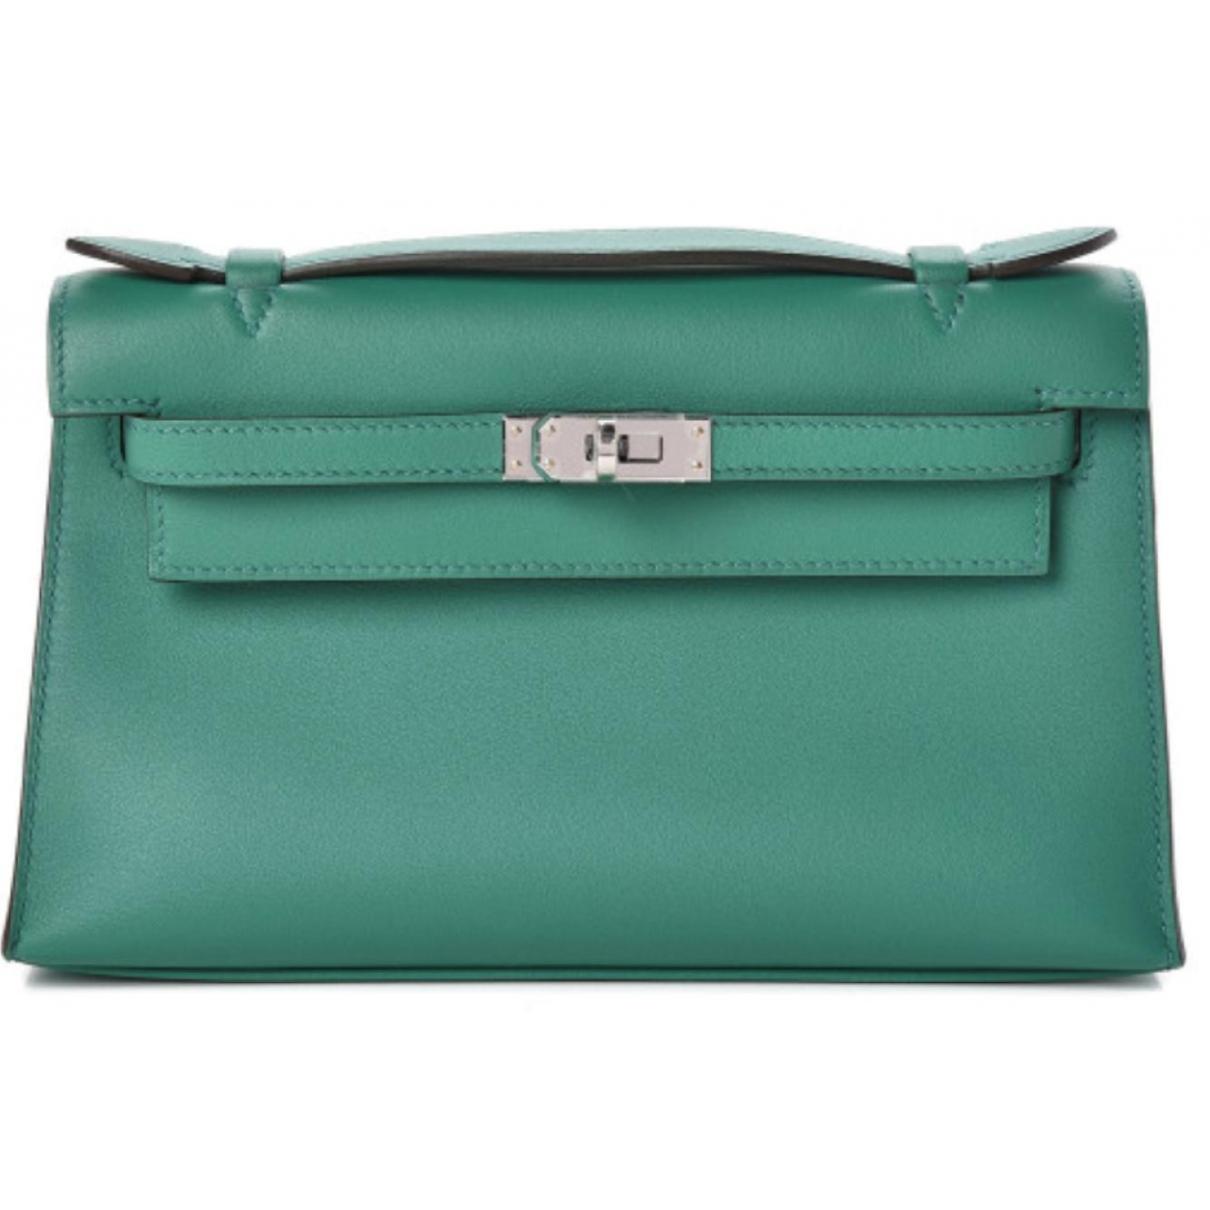 Hermès Kelly Clutch Green Leather Clutch bag for Women \N